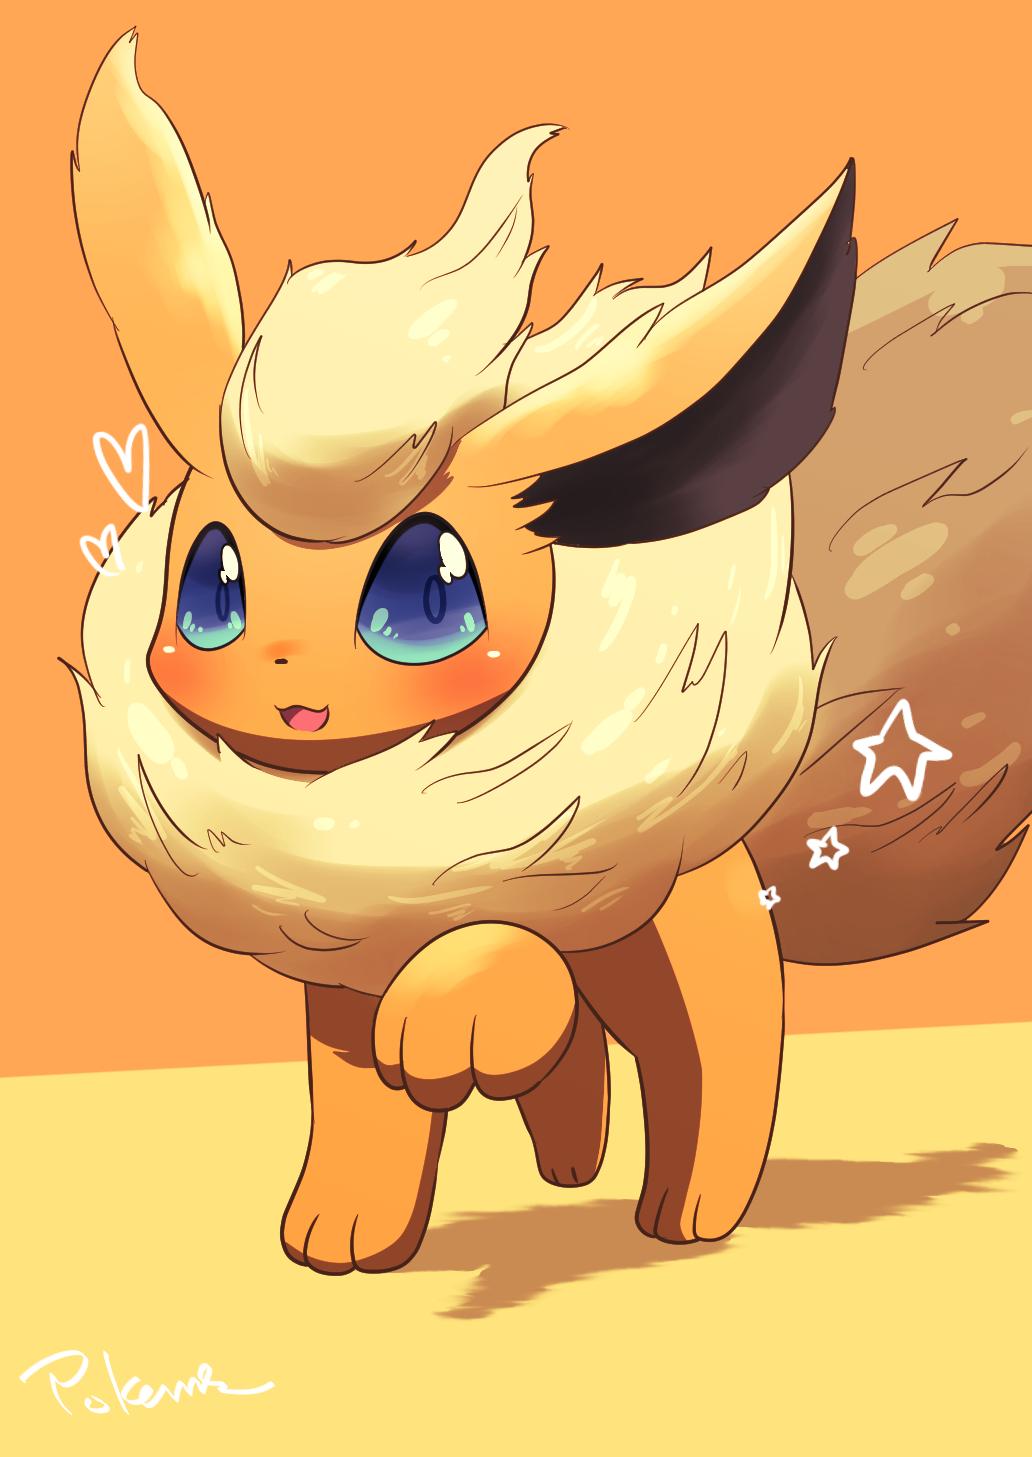 Flareon Cute Pokemon Wallpaper Cute Pokemon Cute Pokemon Pictures